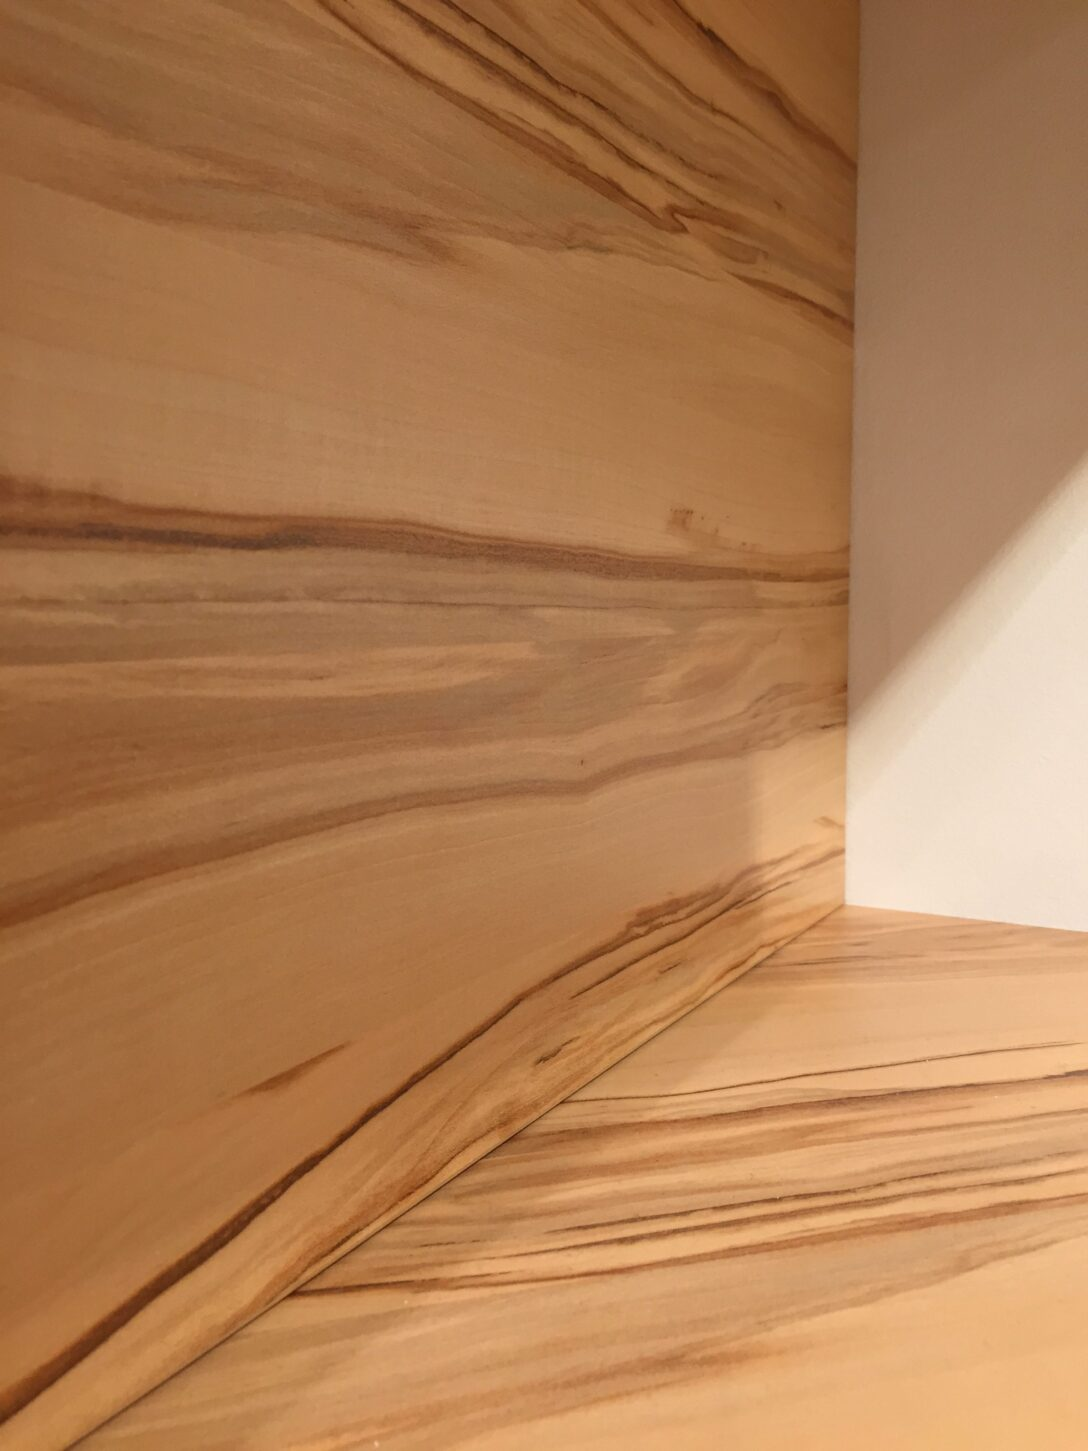 Large Size of Fliesen Rückwand Küche Welche Rckwand In Der Kche Kchen Info Rosa Betonoptik Schneidemaschine Modulküche Ikea Kosten Wasserhähne Arbeitsschuhe Teppich Wohnzimmer Fliesen Rückwand Küche